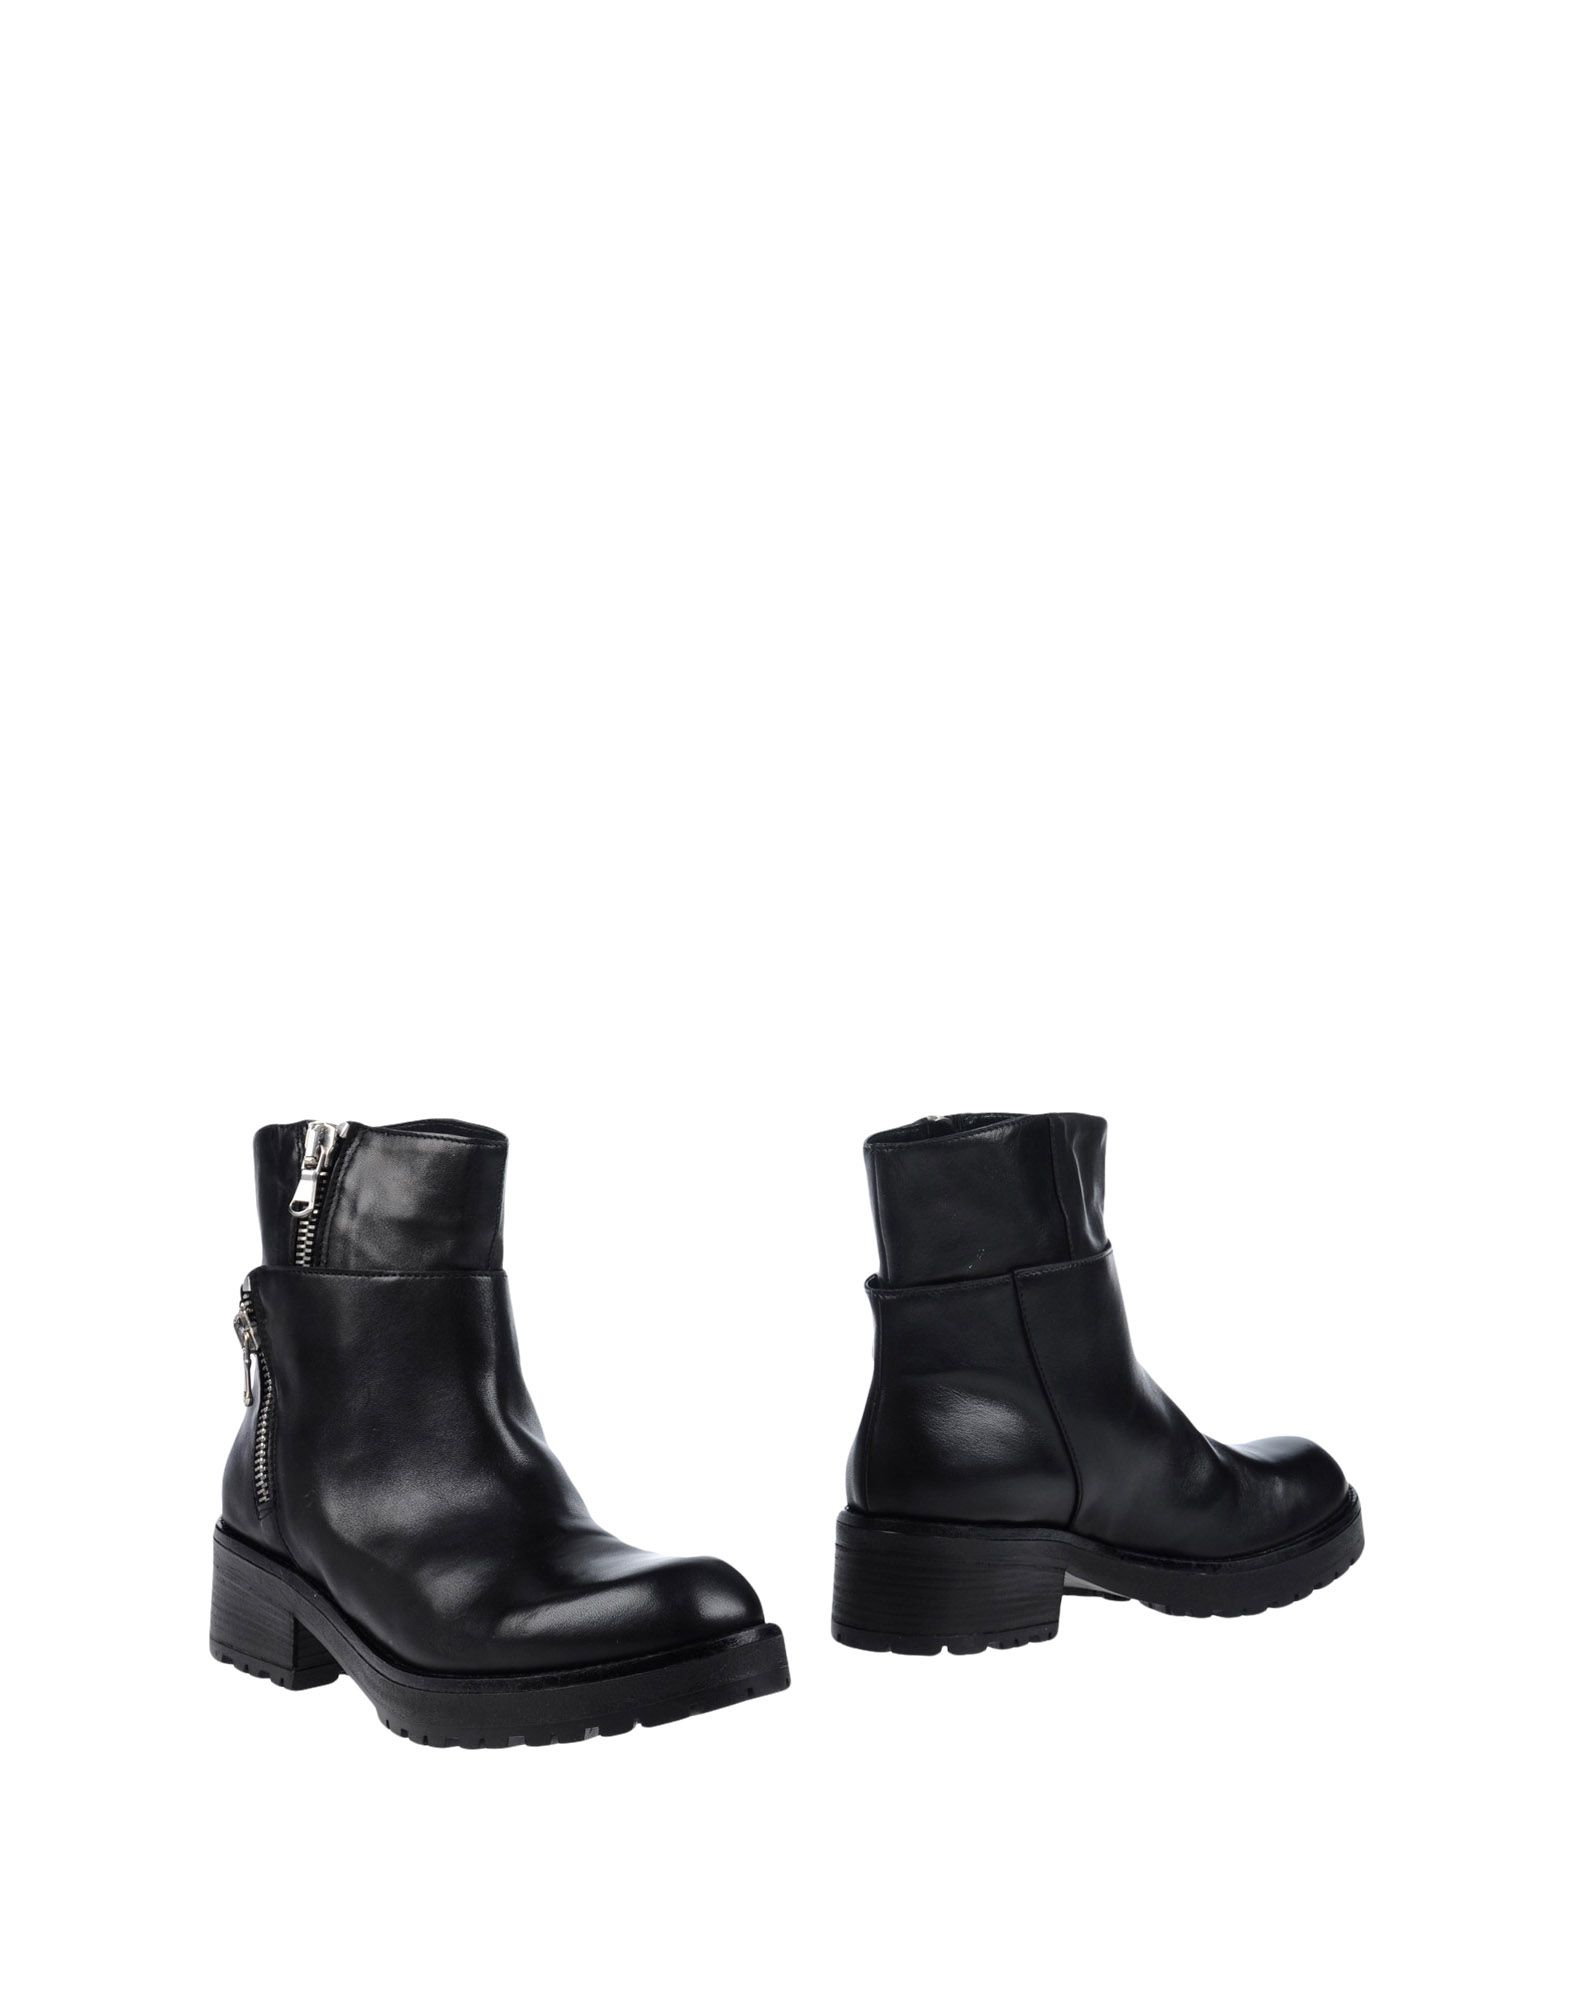 Strategia on Ankle Boot - Women Strategia Ankle Boots online on Strategia  Australia - 11239552KK bb5cfa